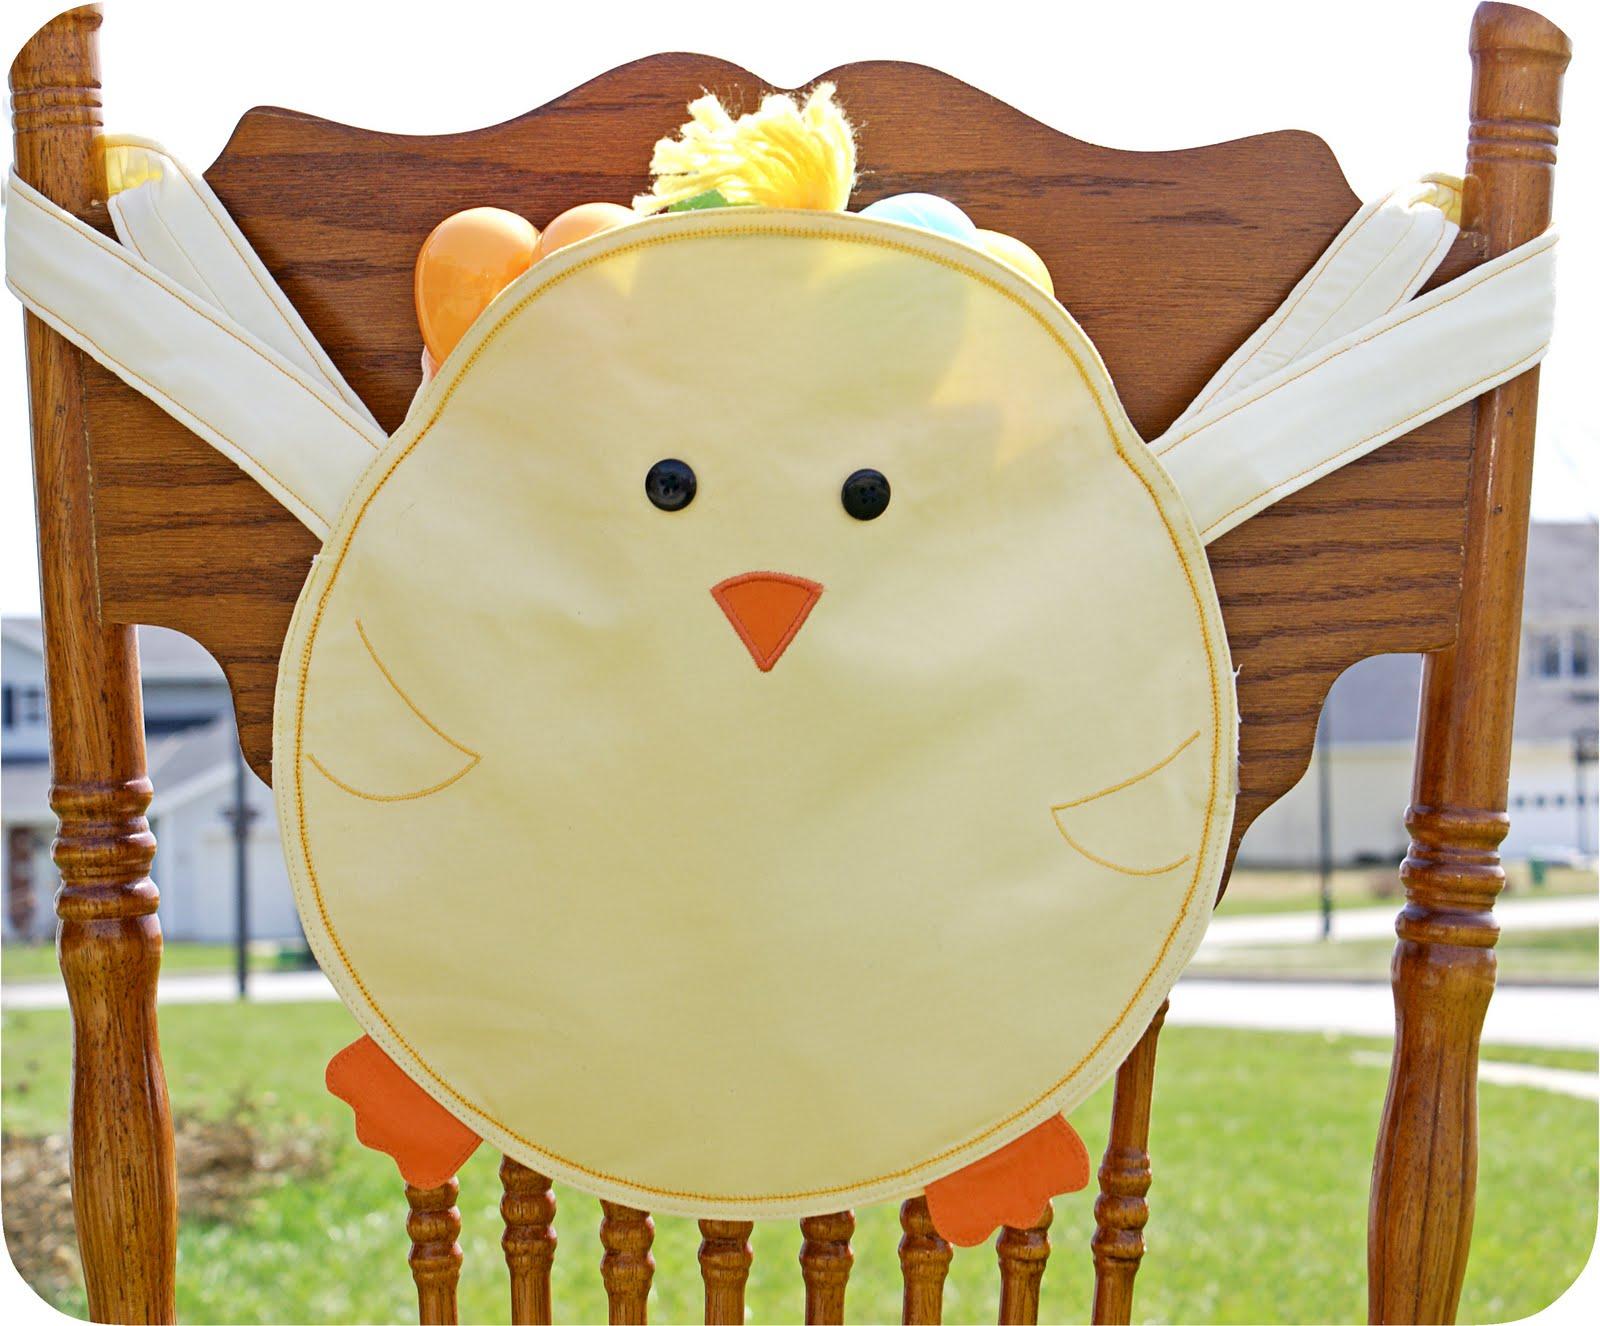 Swell Five Little Crafty Birdies Easter Chick Bag Basket Spiritservingveterans Wood Chair Design Ideas Spiritservingveteransorg